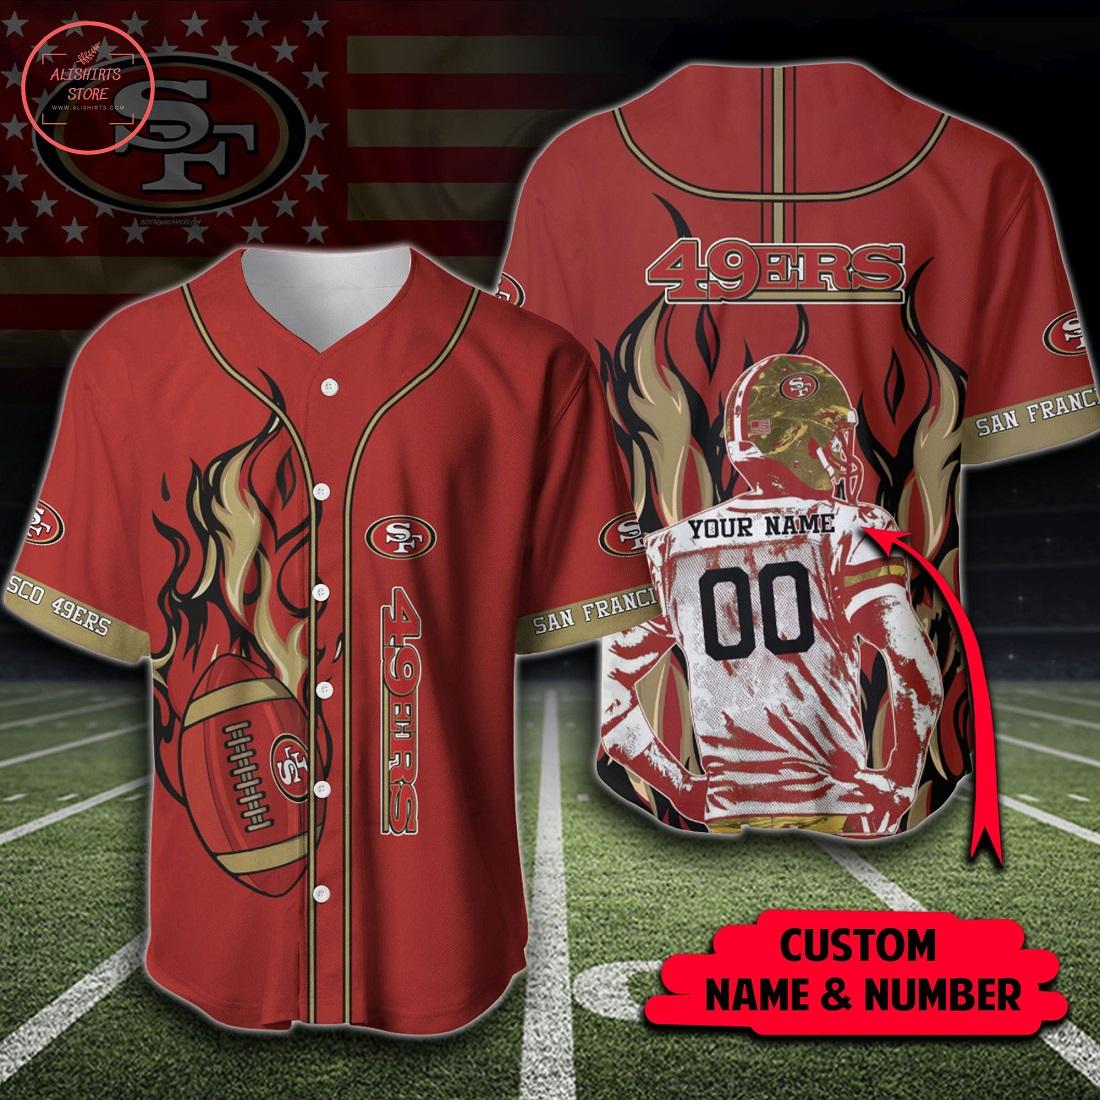 NFL San Francisco 49ers Personalized Baseball Jersey